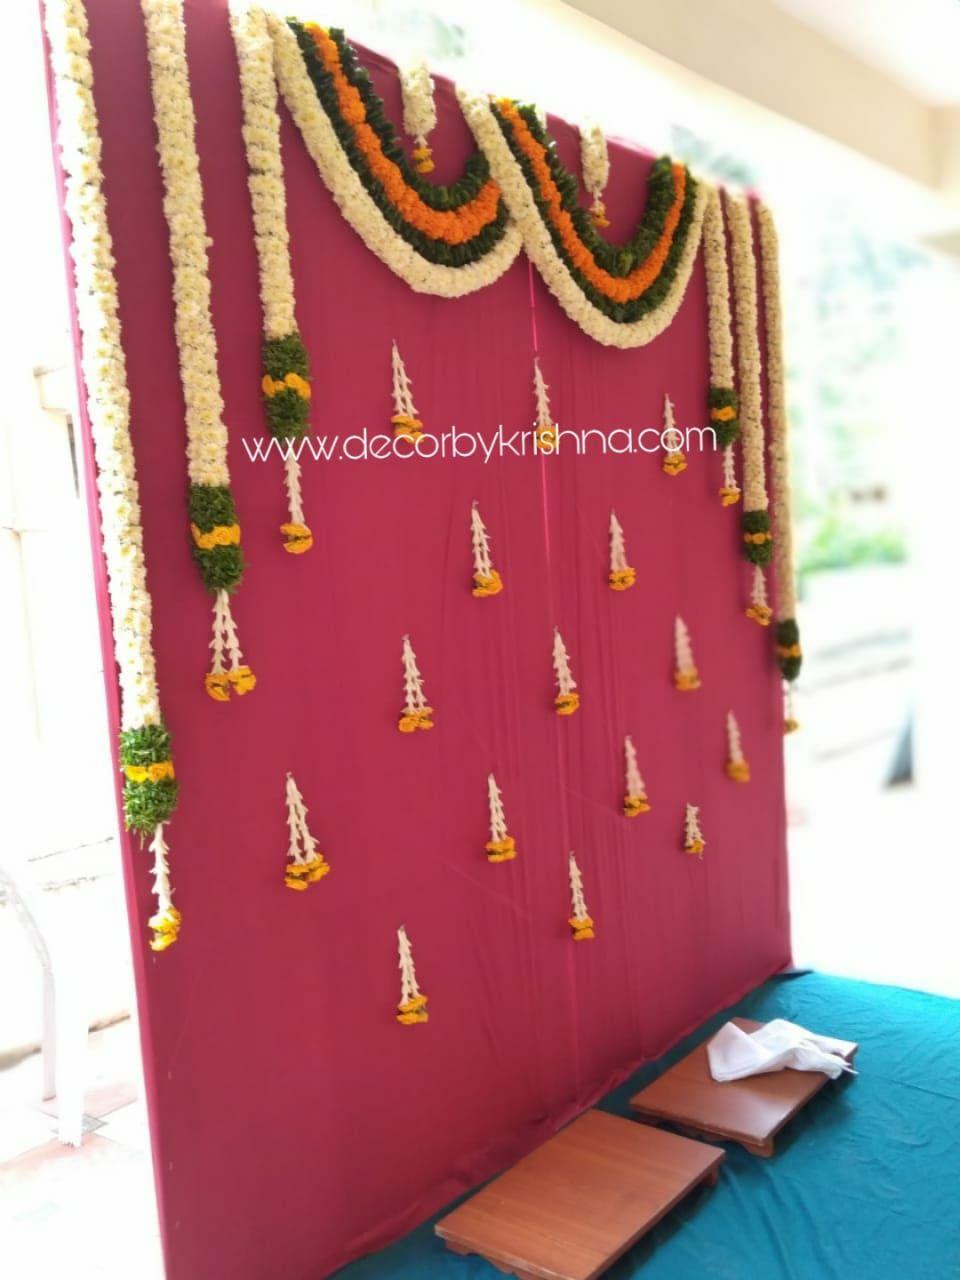 Decorbykrishna Is Taking Orders For Eco Friendly Home Based Events Decor Like Pelliko Wedding Design Decoration Leaf Decor Wedding Indian Wedding Decorations